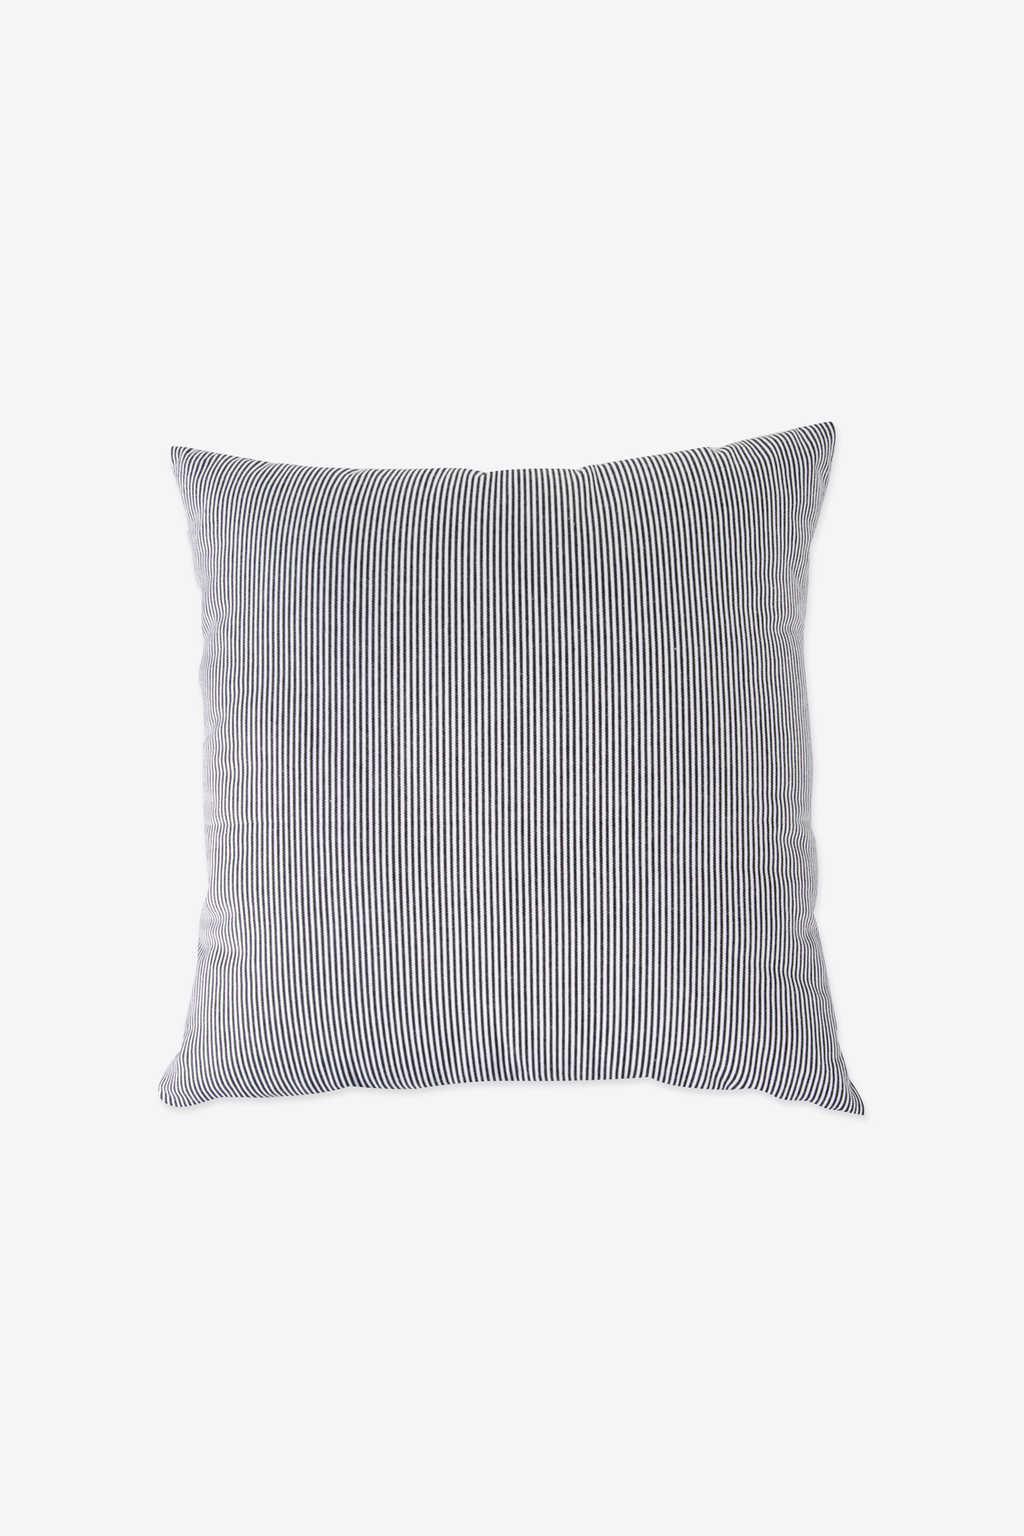 Striped Pillow 1844 Navy 1